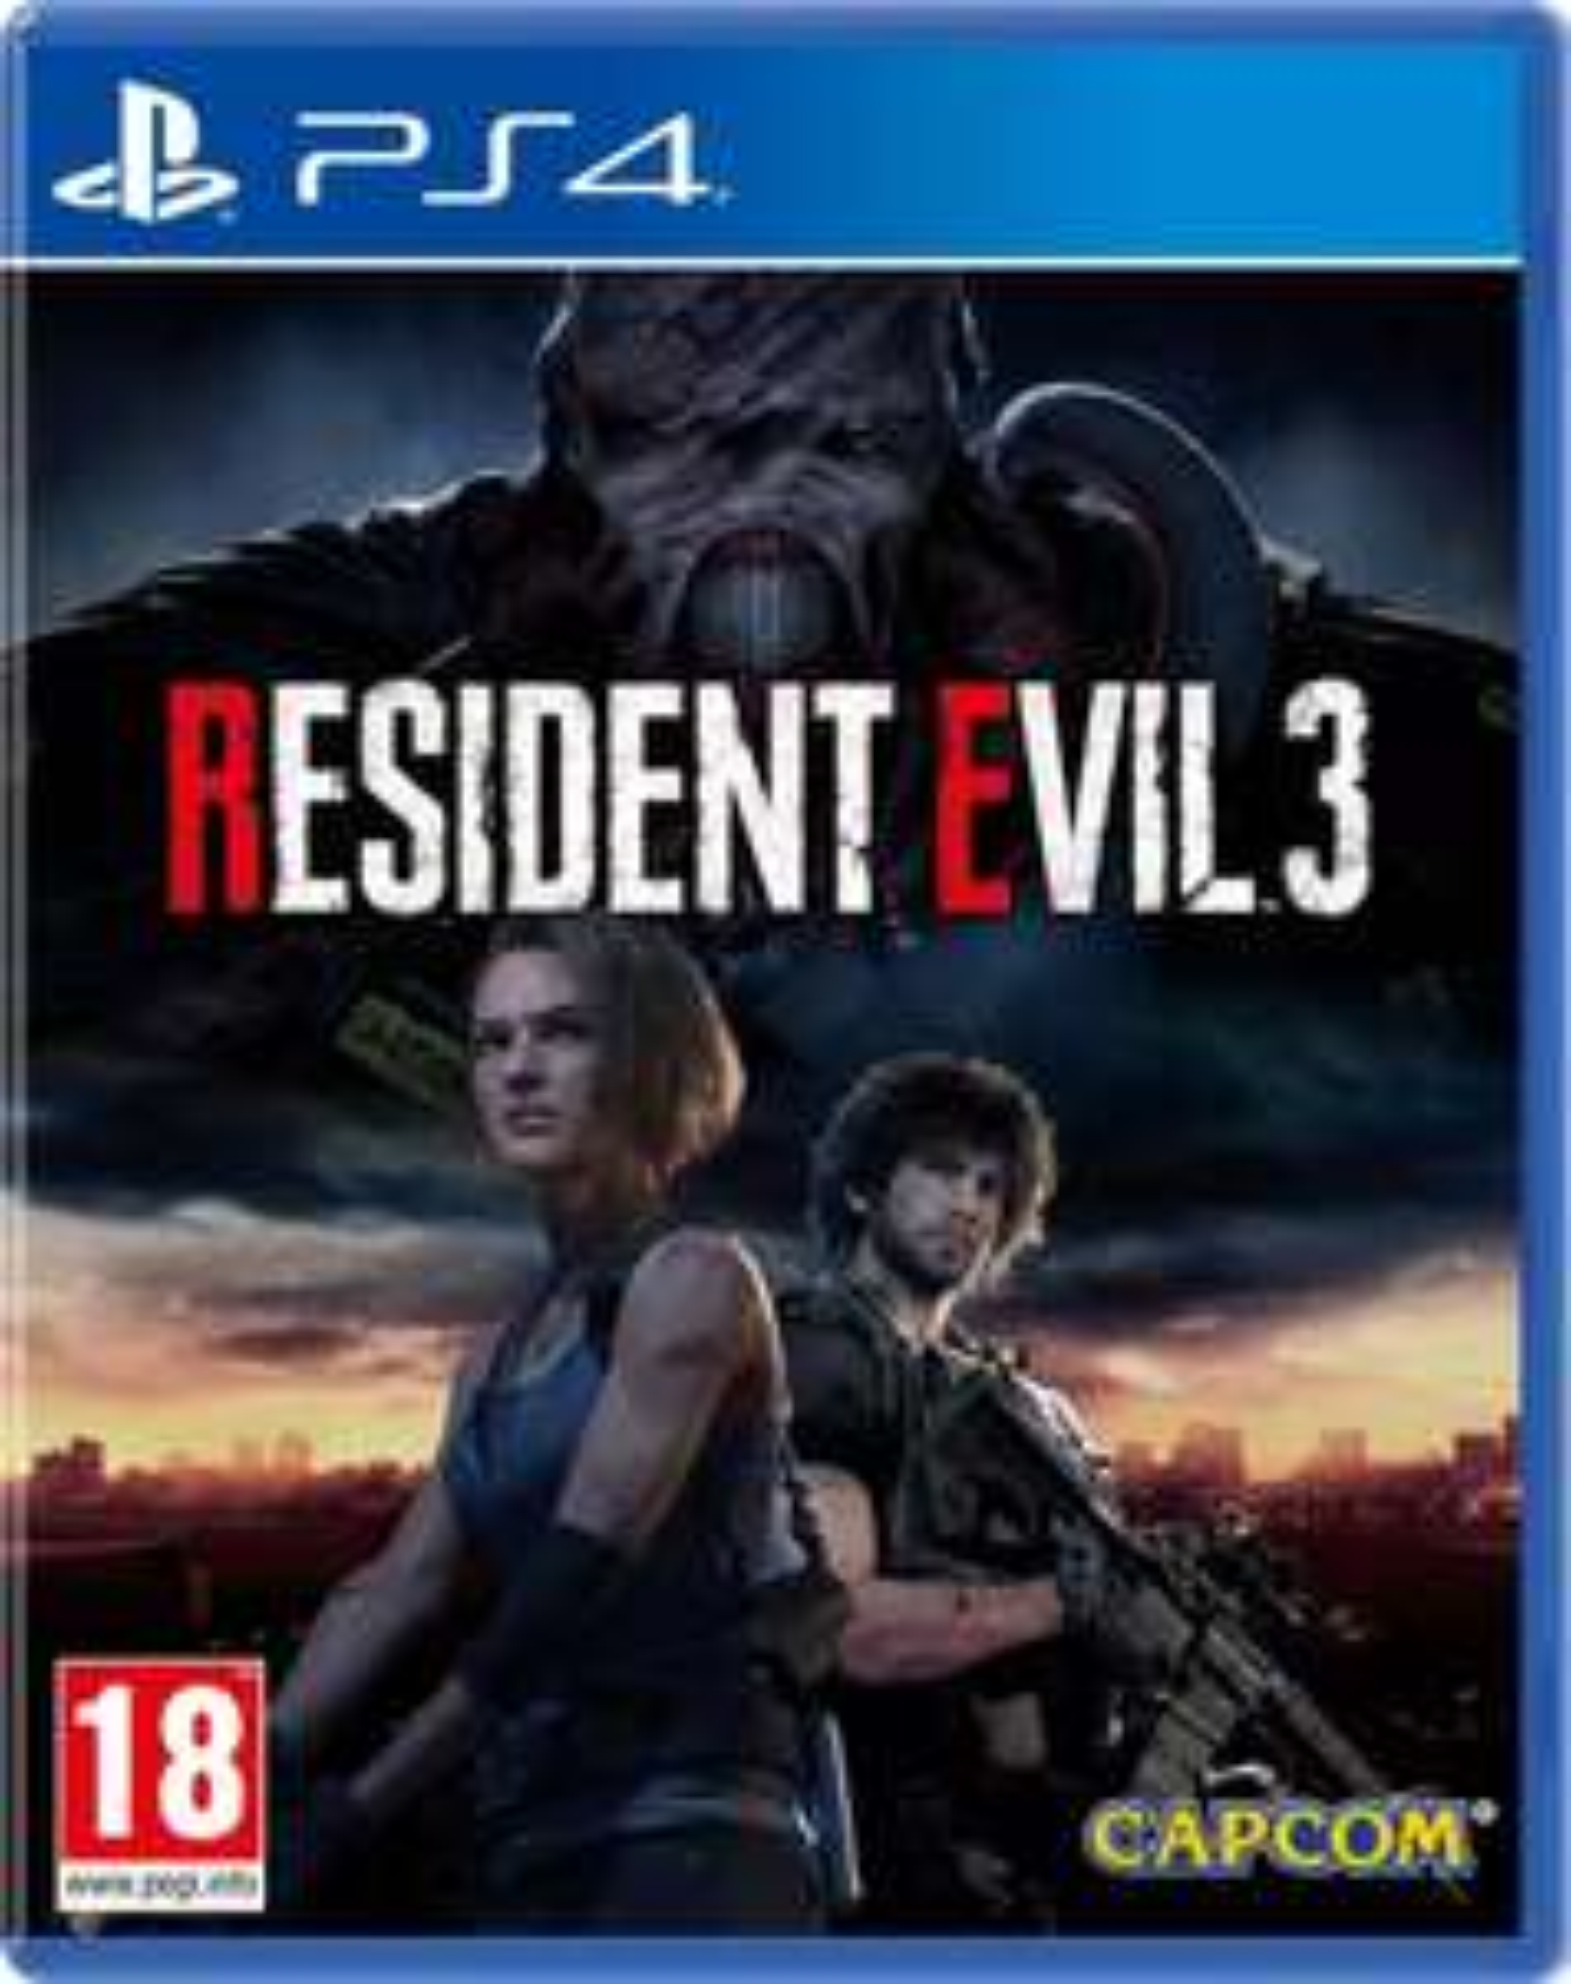 Resident Evil 3 PS4 PL Pudełko - Ceneo